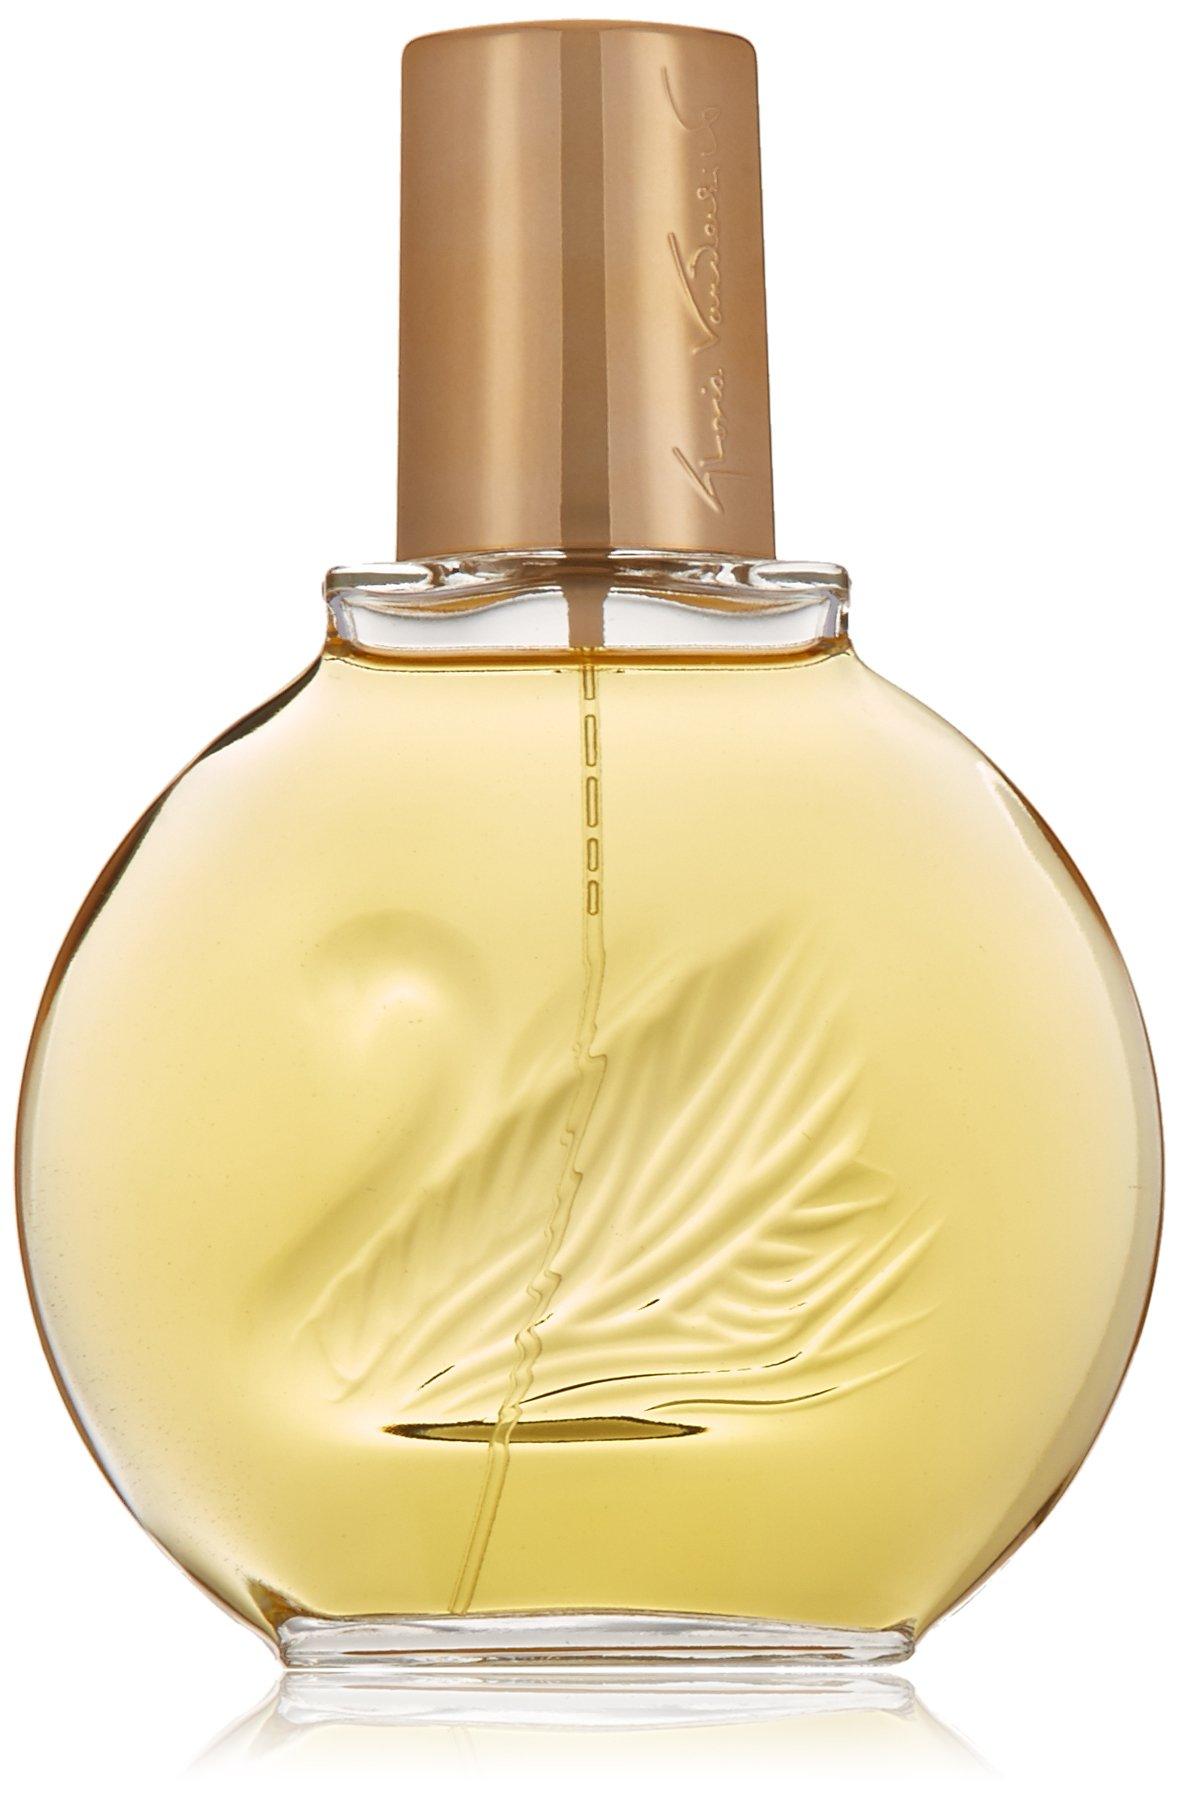 Gloria Vanderbilt Agua de tocador para mujeres - 100 ml product image